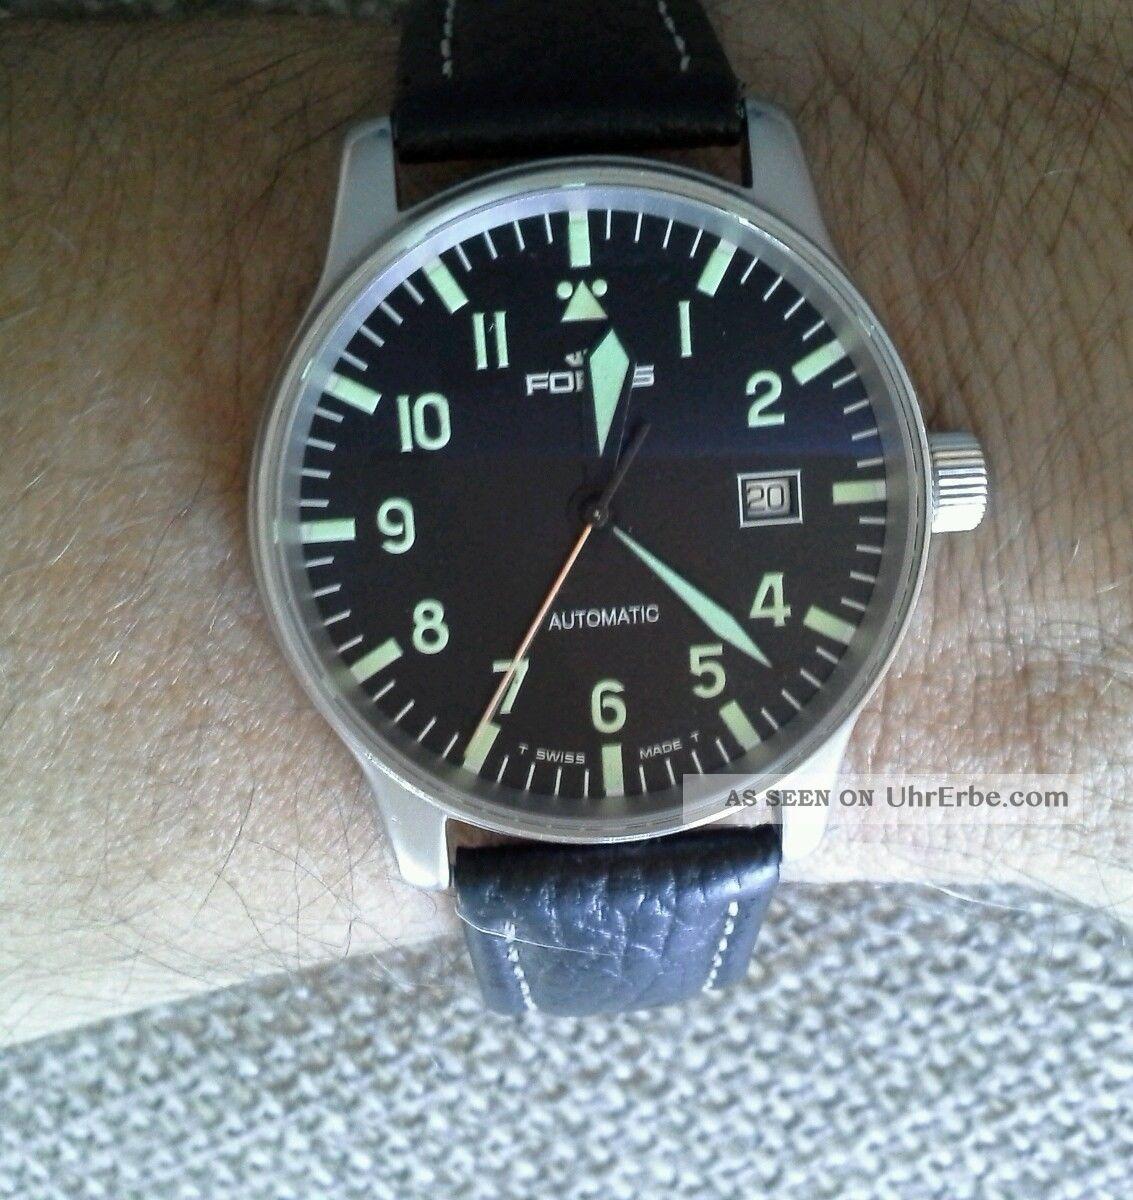 Fortis Armband Uhr Fliegeruhr Leder Faltschliesse Automatik Armbanduhren Bild